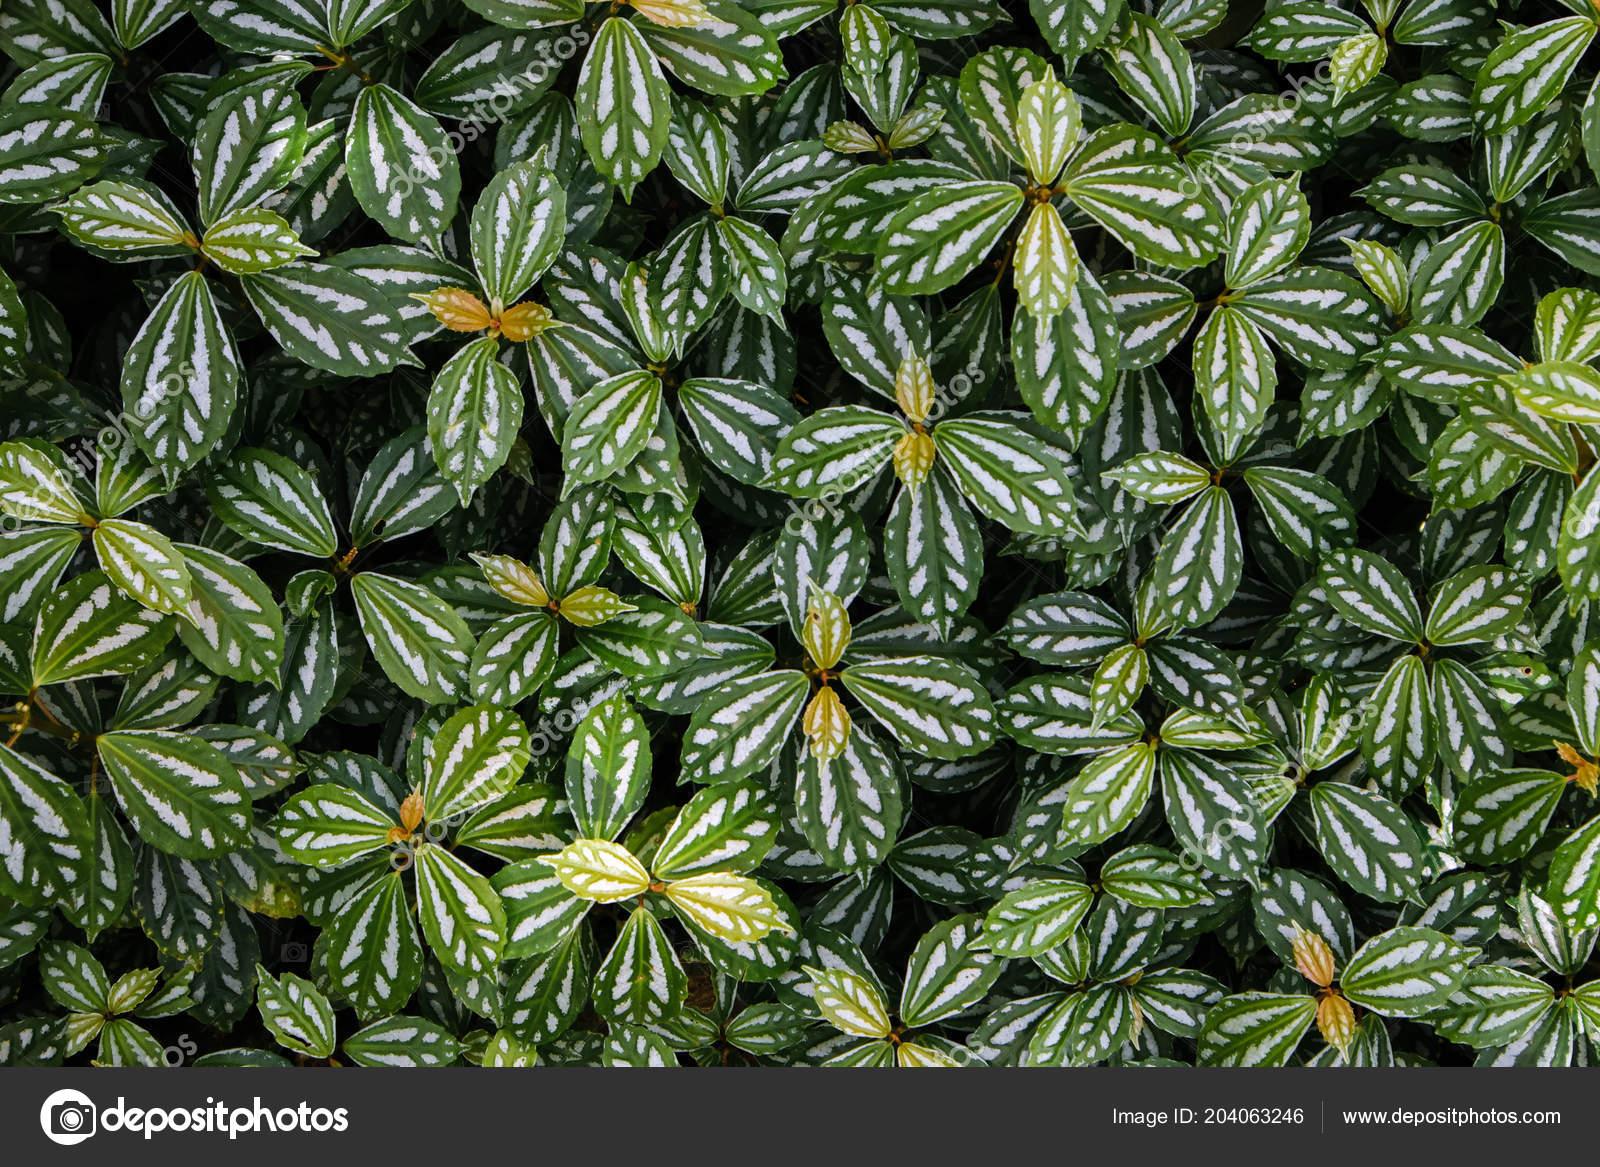 Green Ivy Bush Wall Garden \u2014 Stock Photo © nattapol 204063246